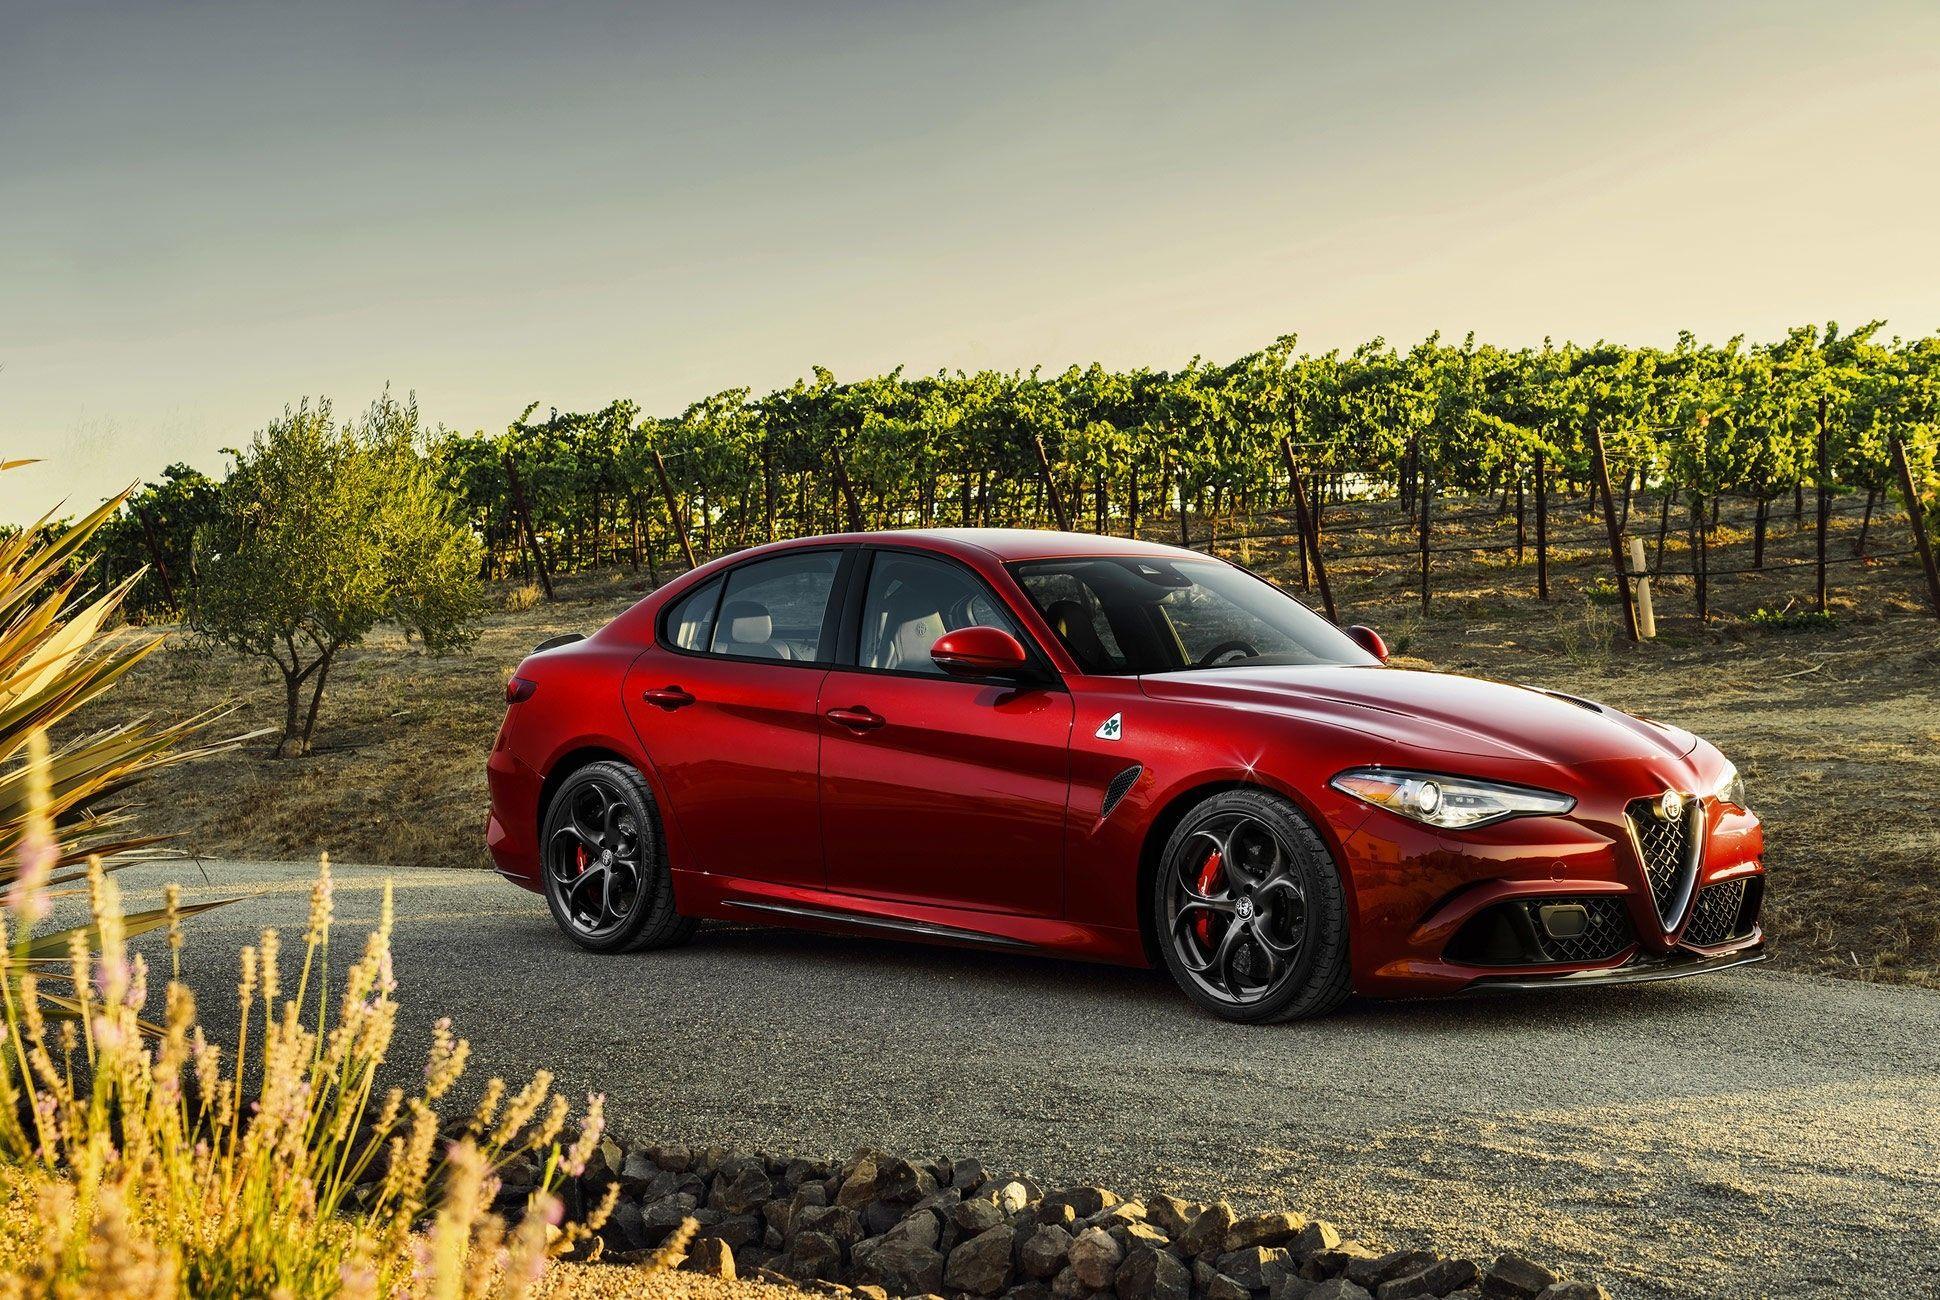 2019 Alfa Romeo Giulia Redesign Price And Review Alfa Romeo Quadrifoglio Alfa Romeo Giulia Quadrifoglio Alfa Romeo Giulia